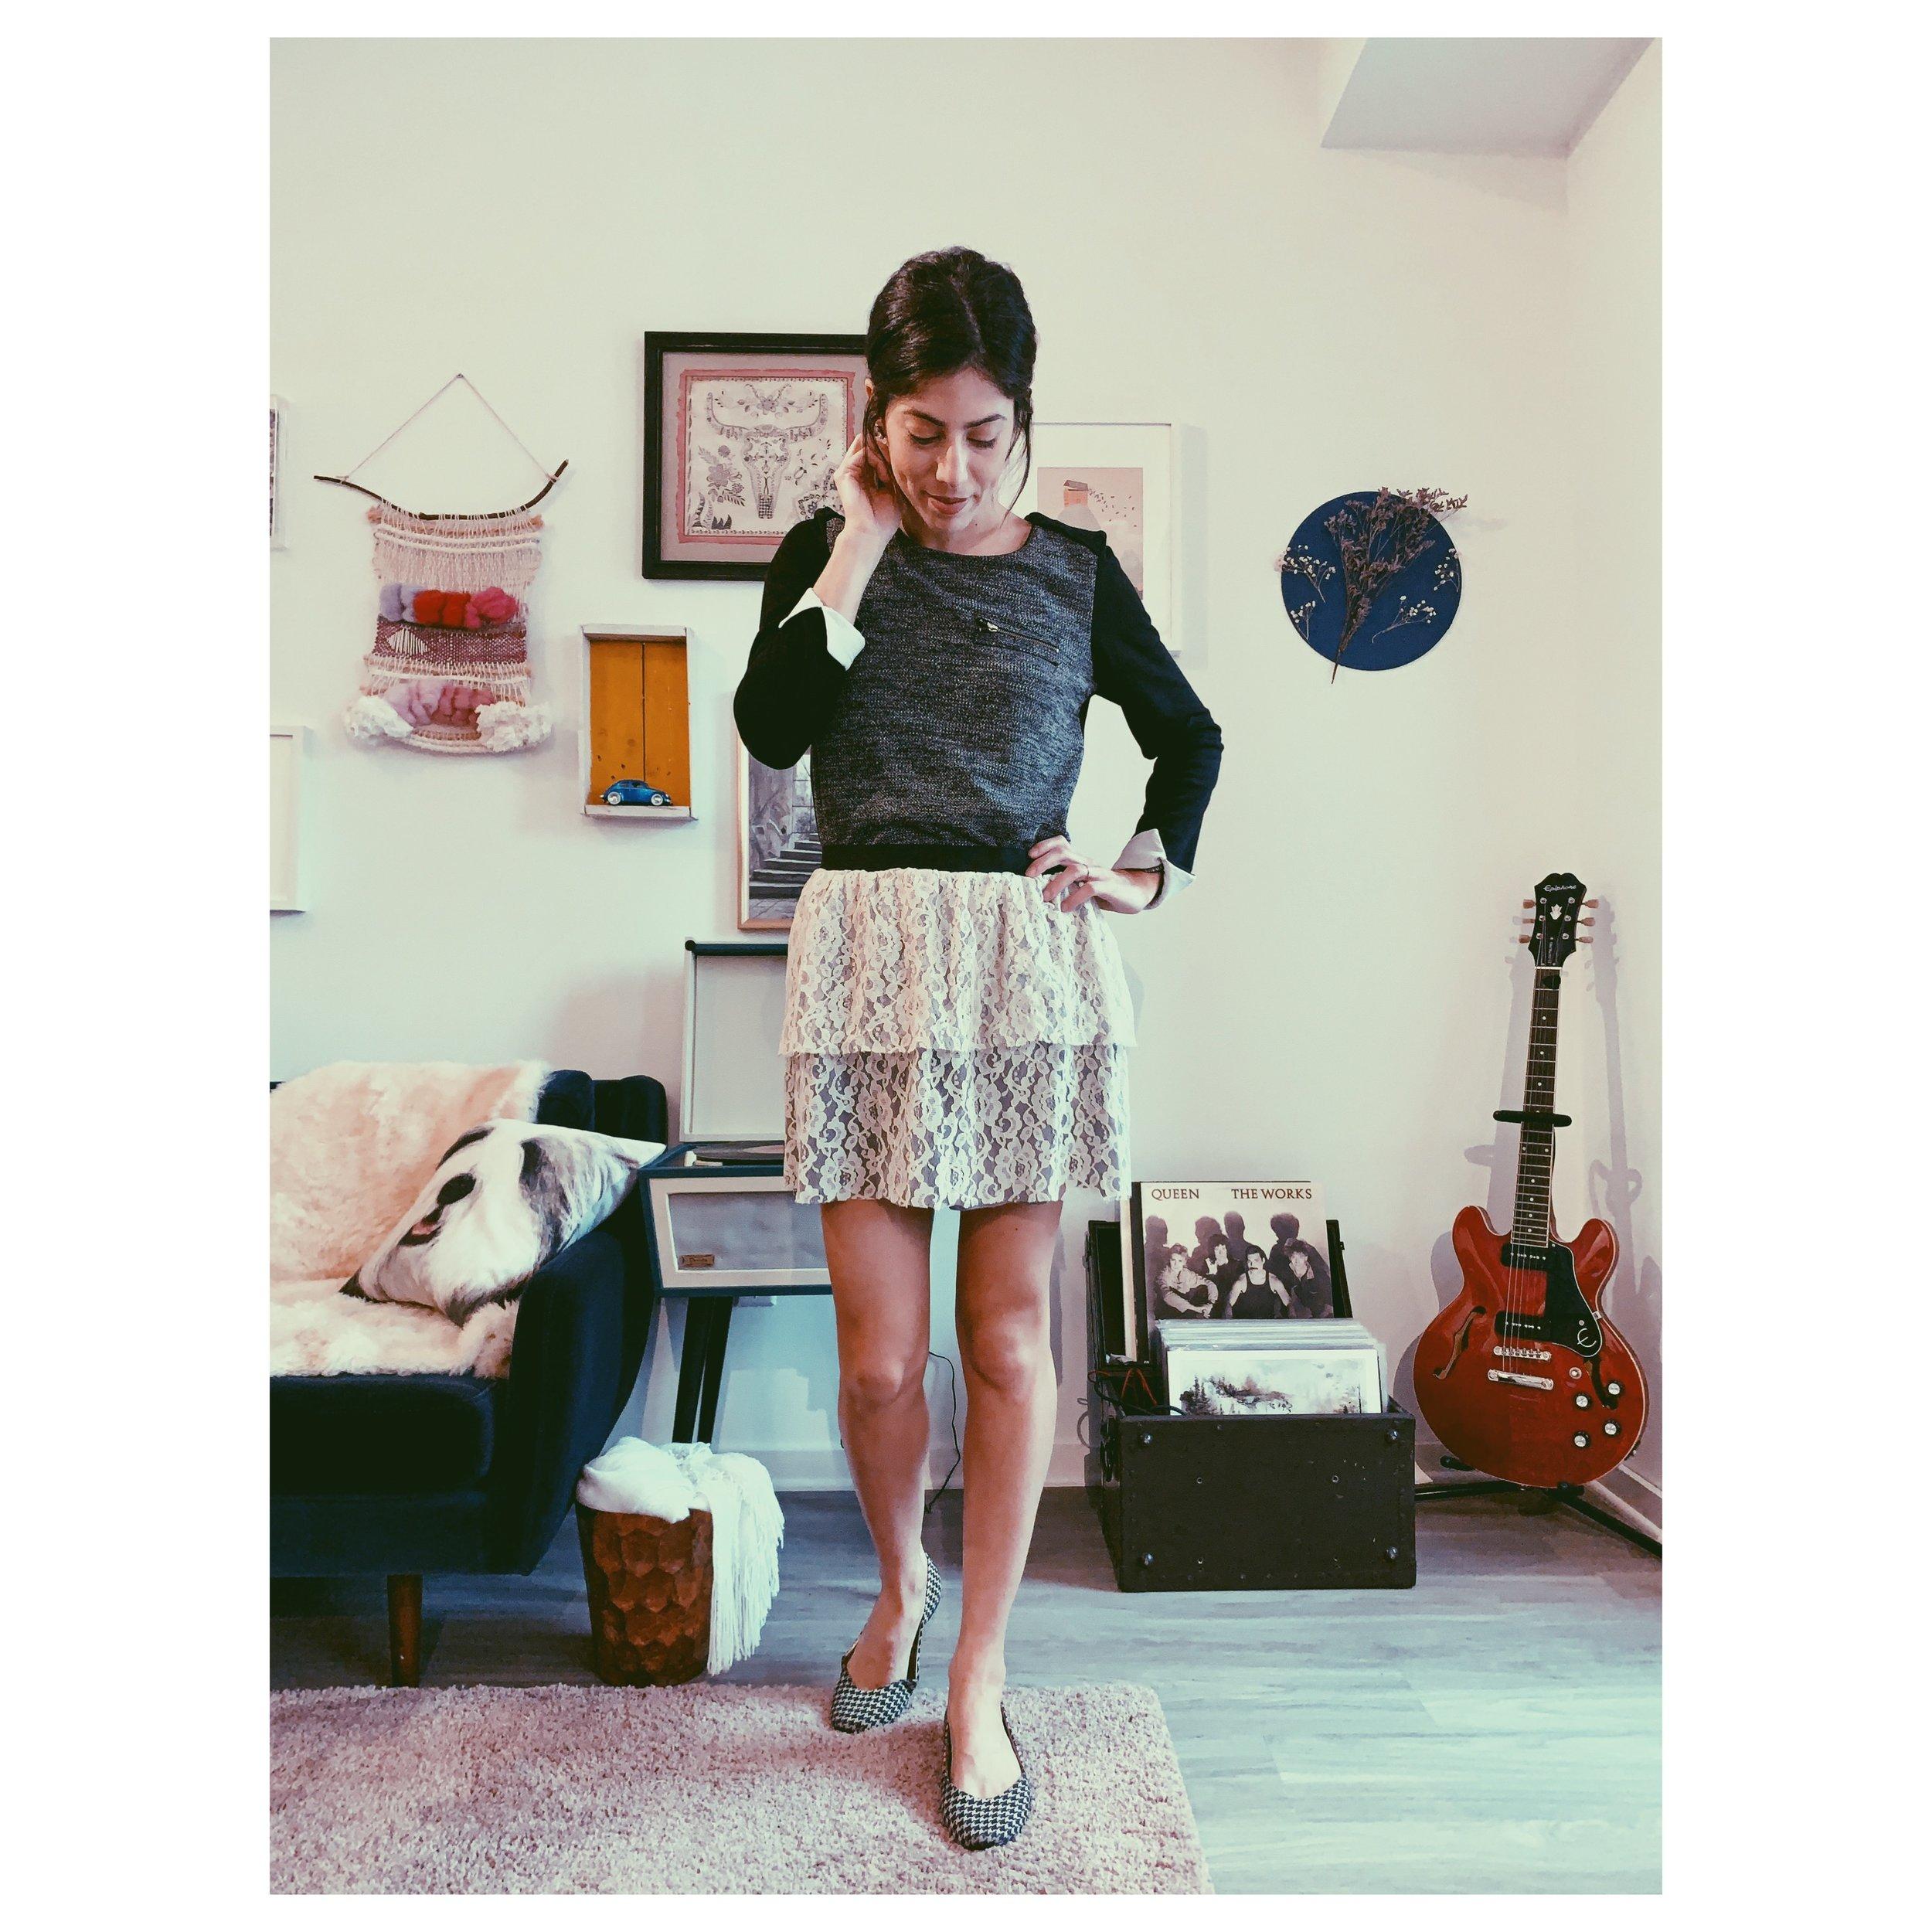 Saia renda instagram 3.JPG